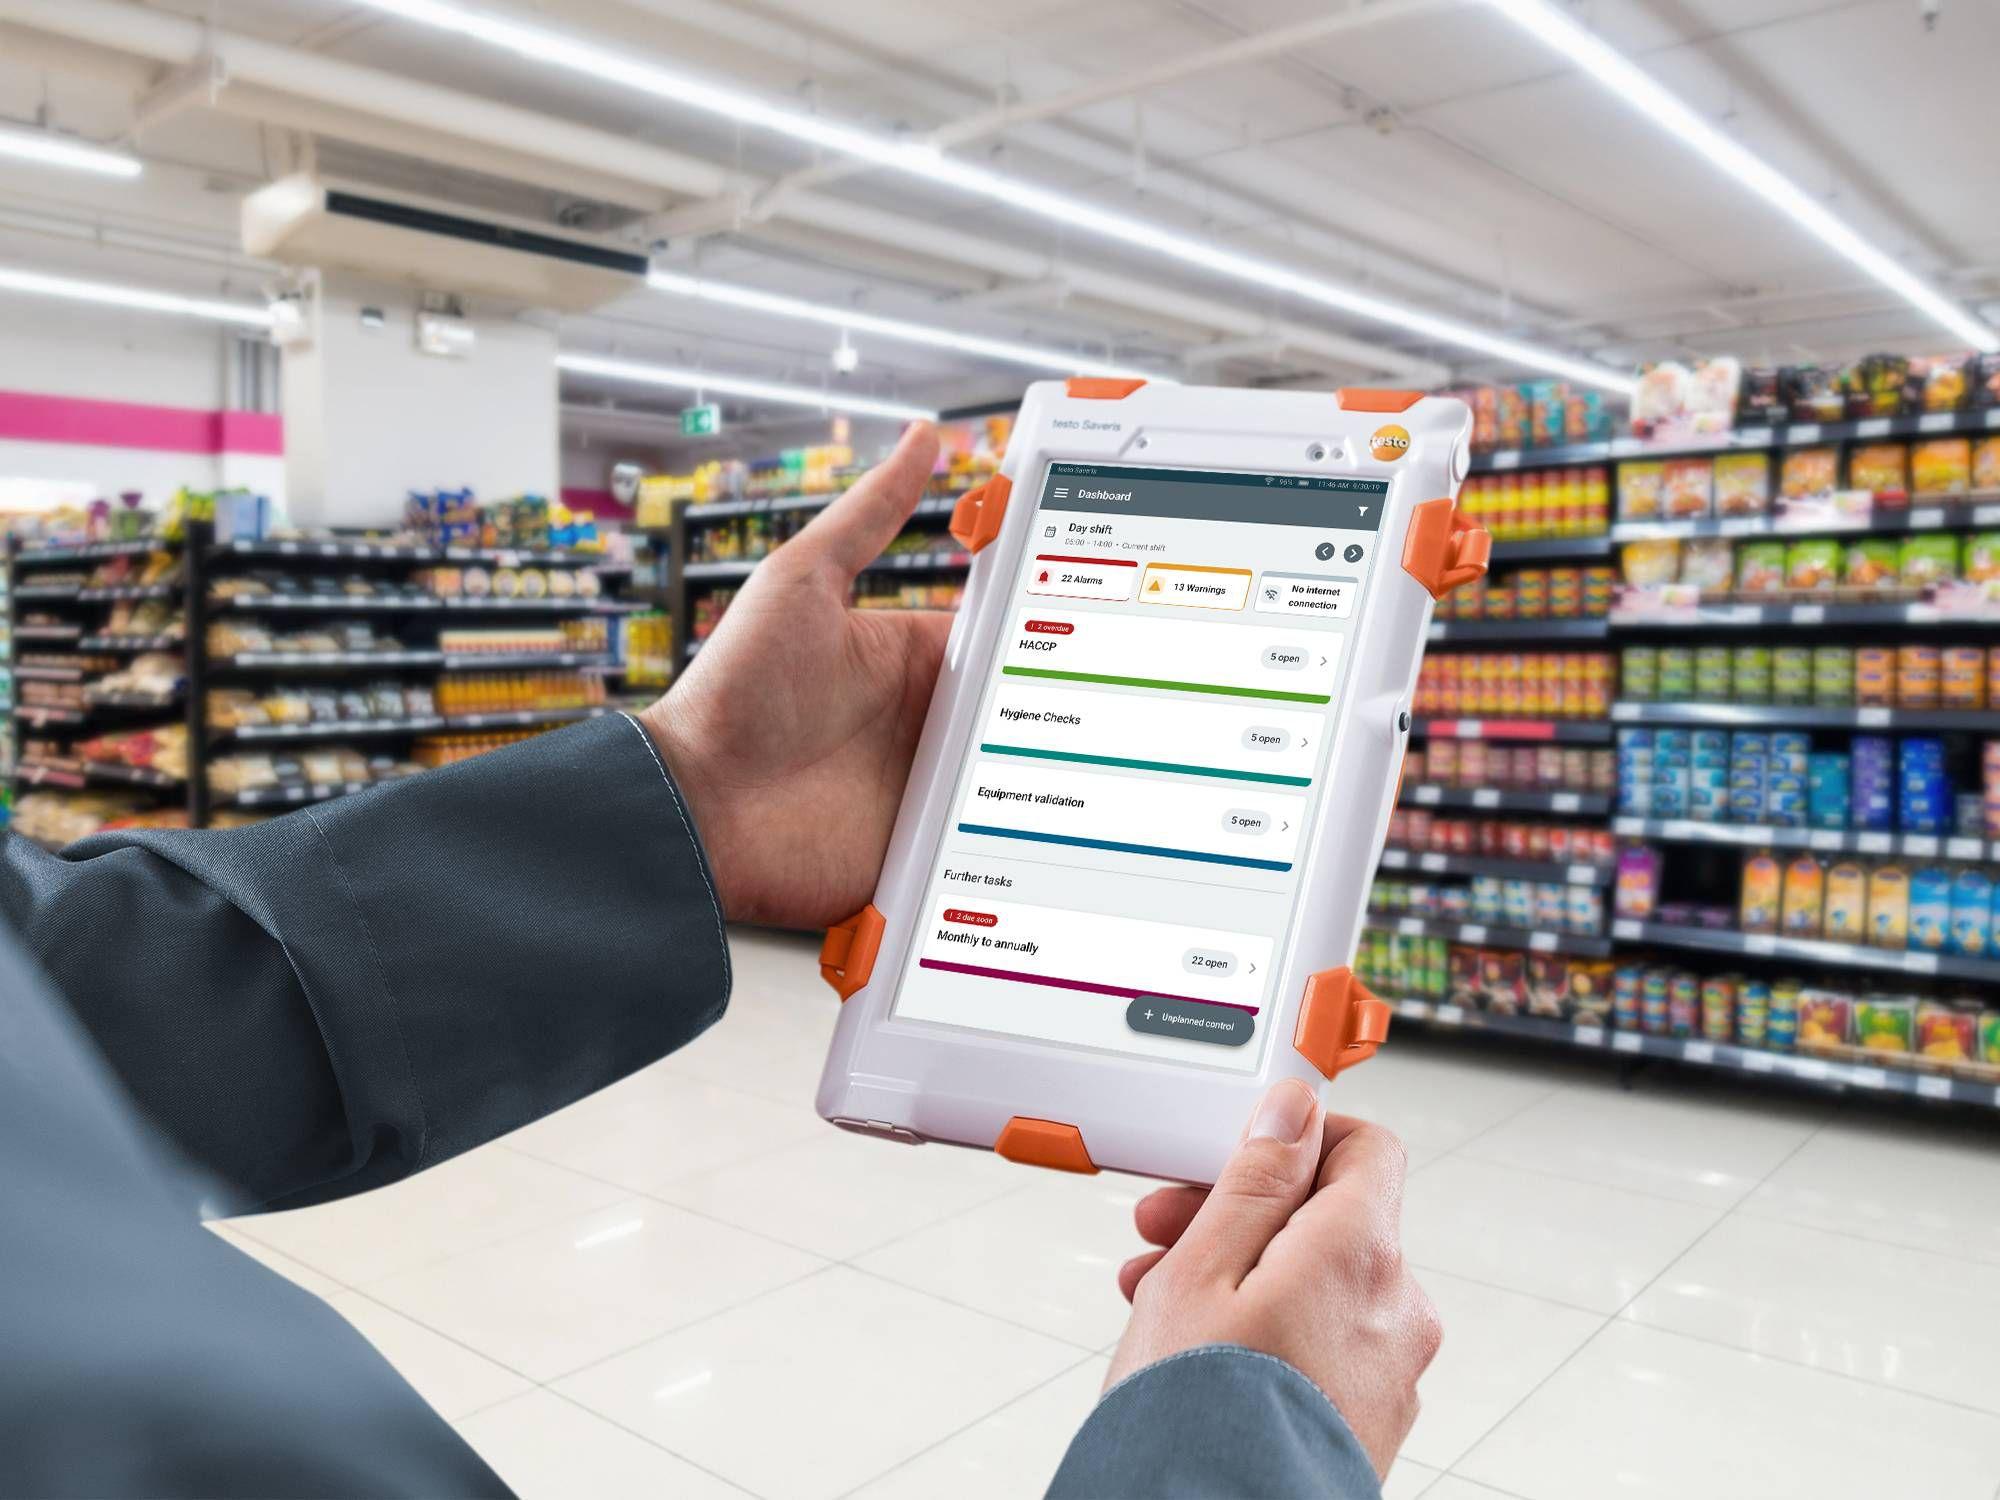 Optimizing processes supermarket